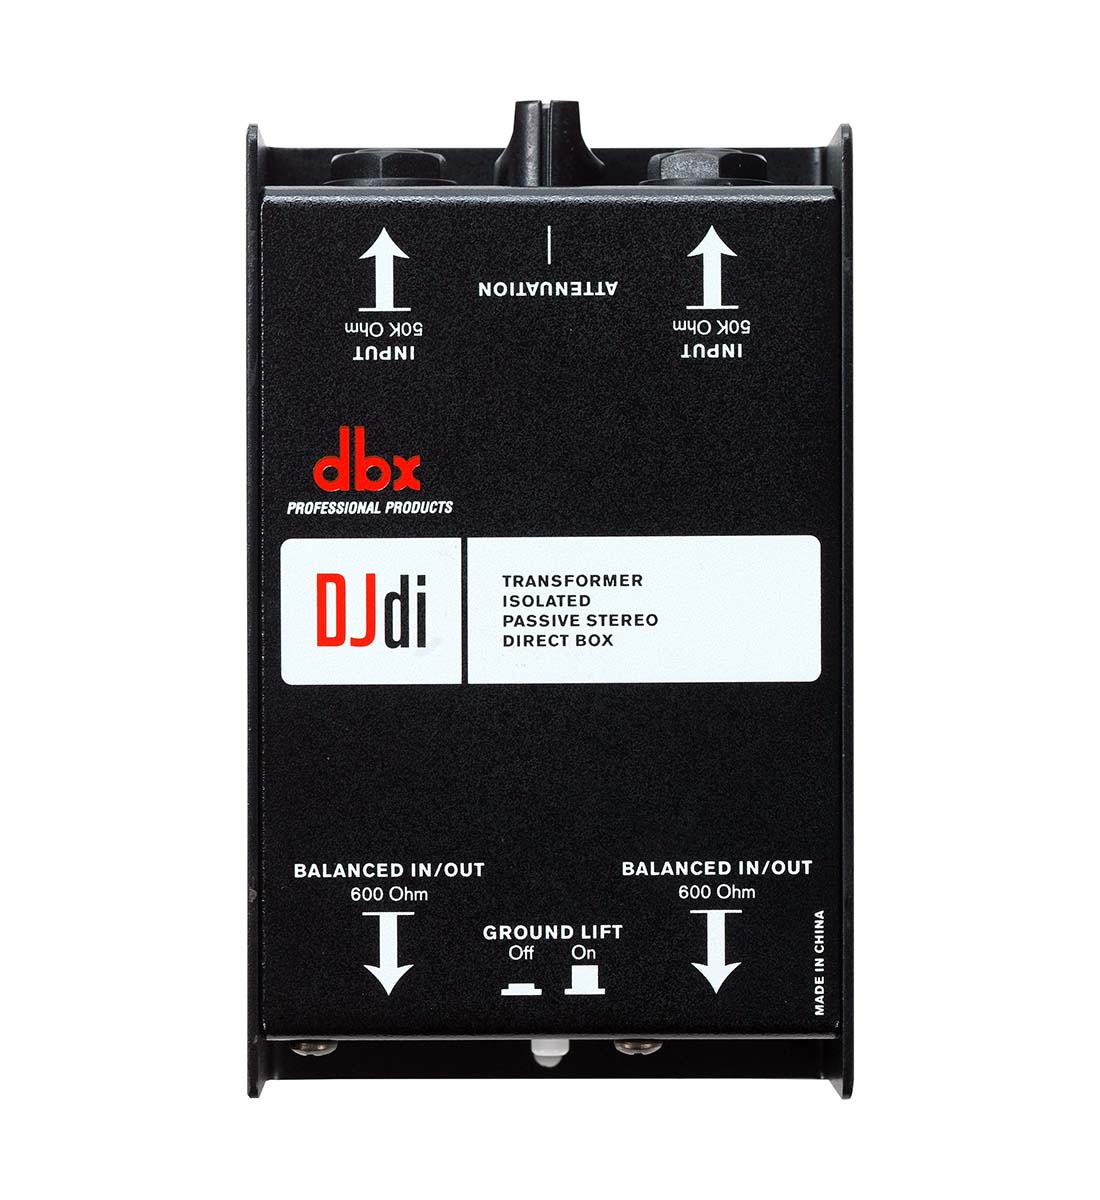 dbx-DJdi-top.jpg